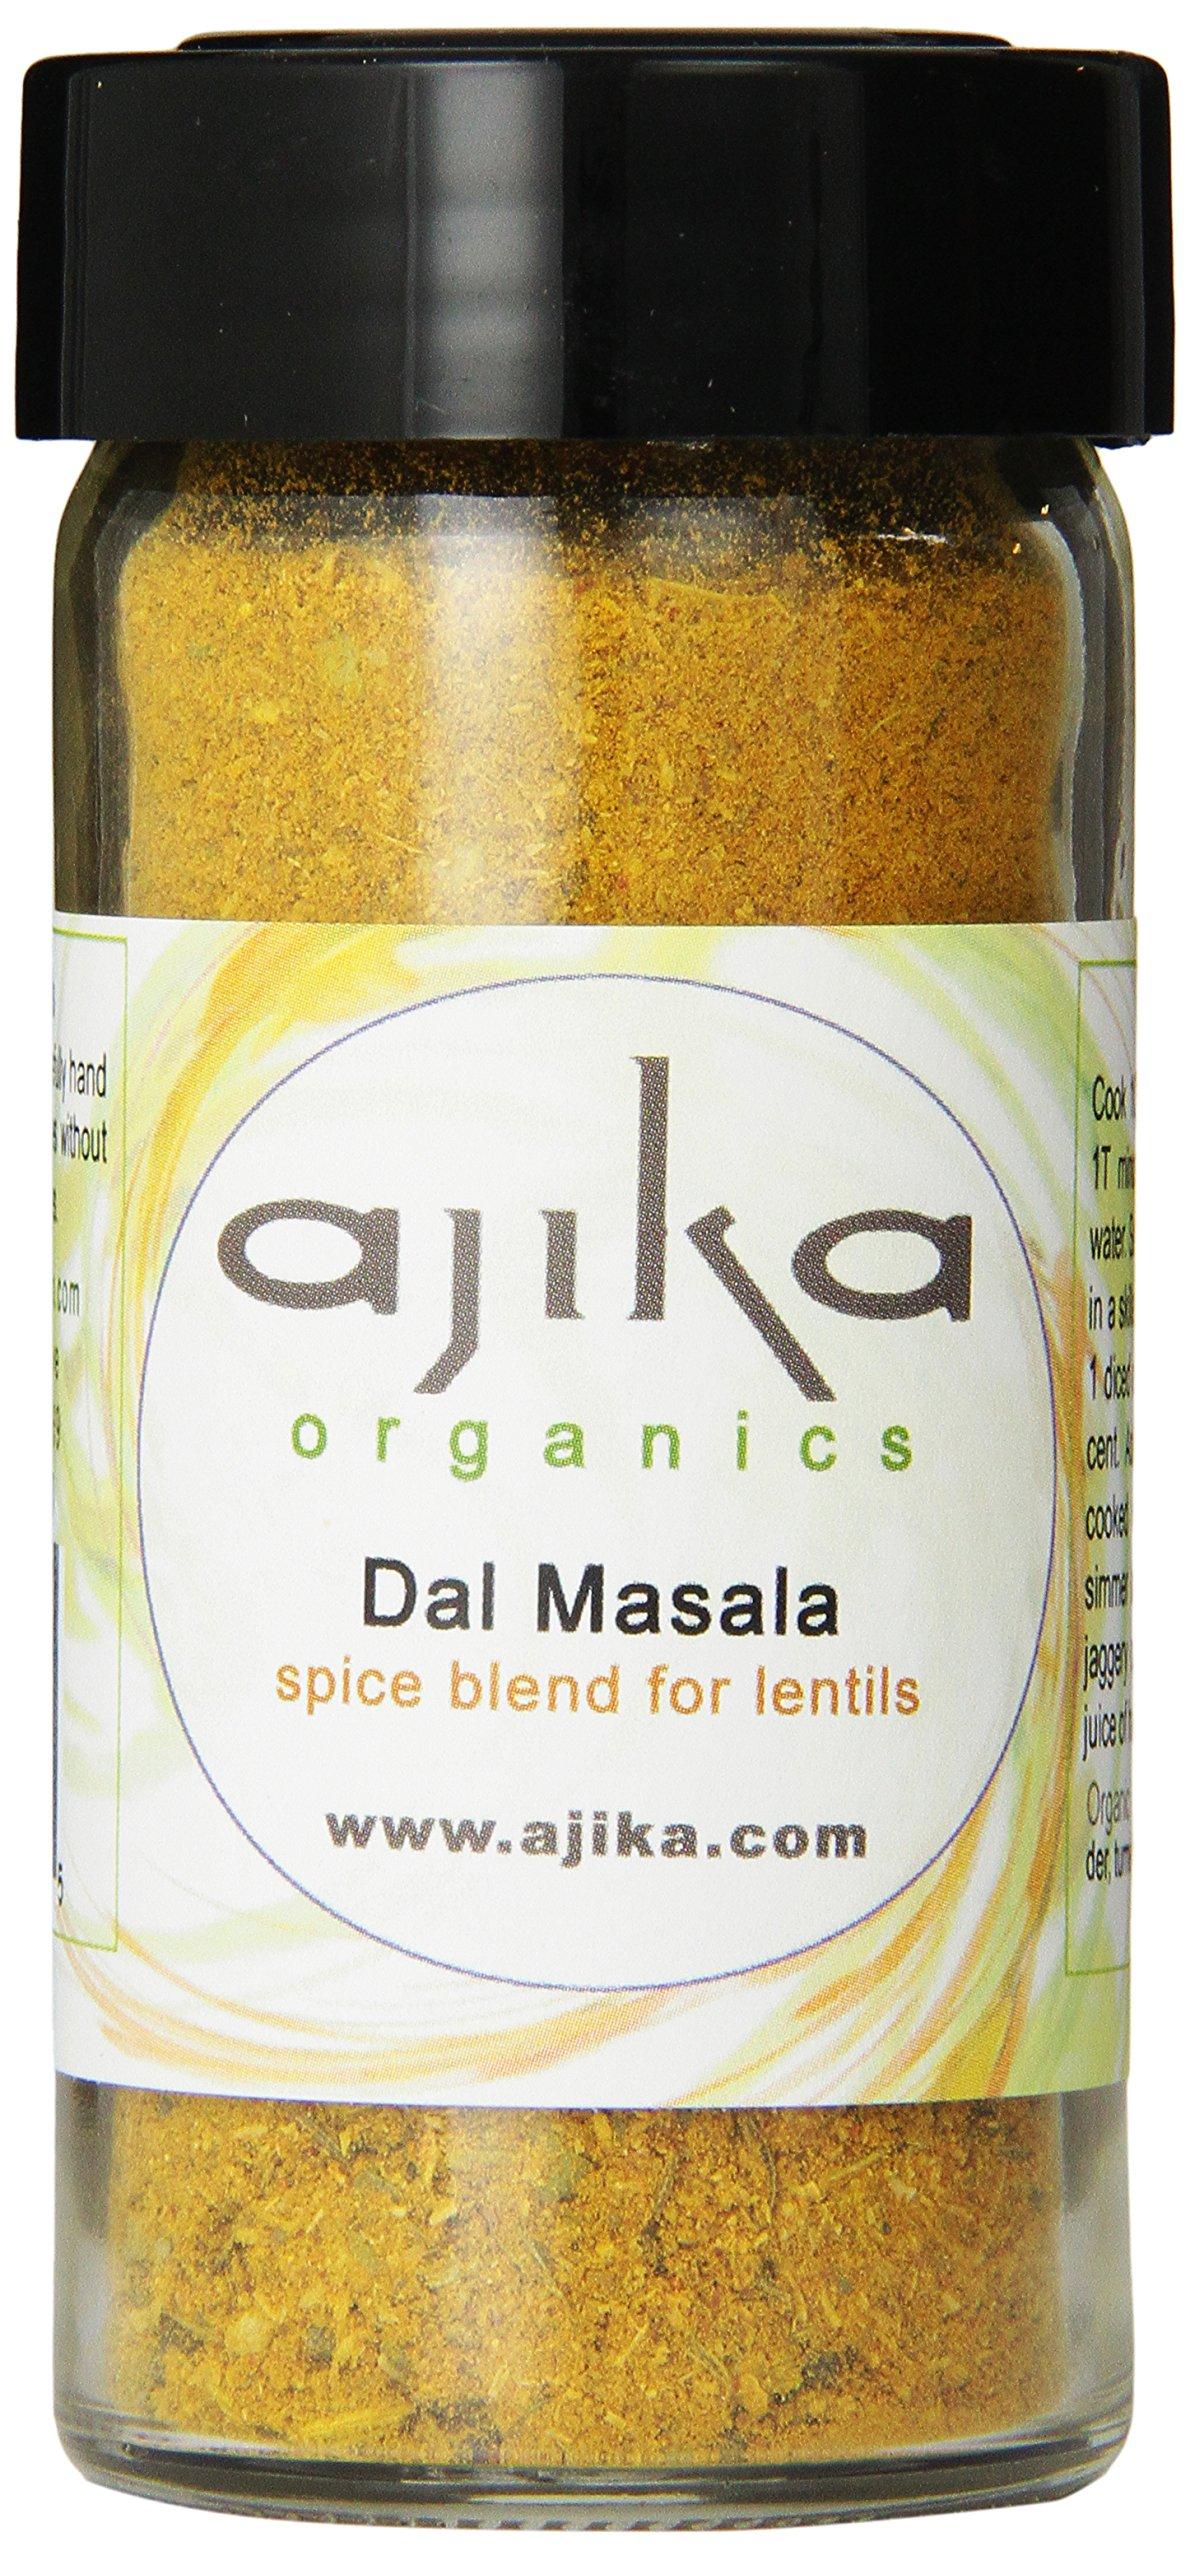 Ajika Organics Dal Masala, Spice Blend for Lentils, 1.8-Ounce